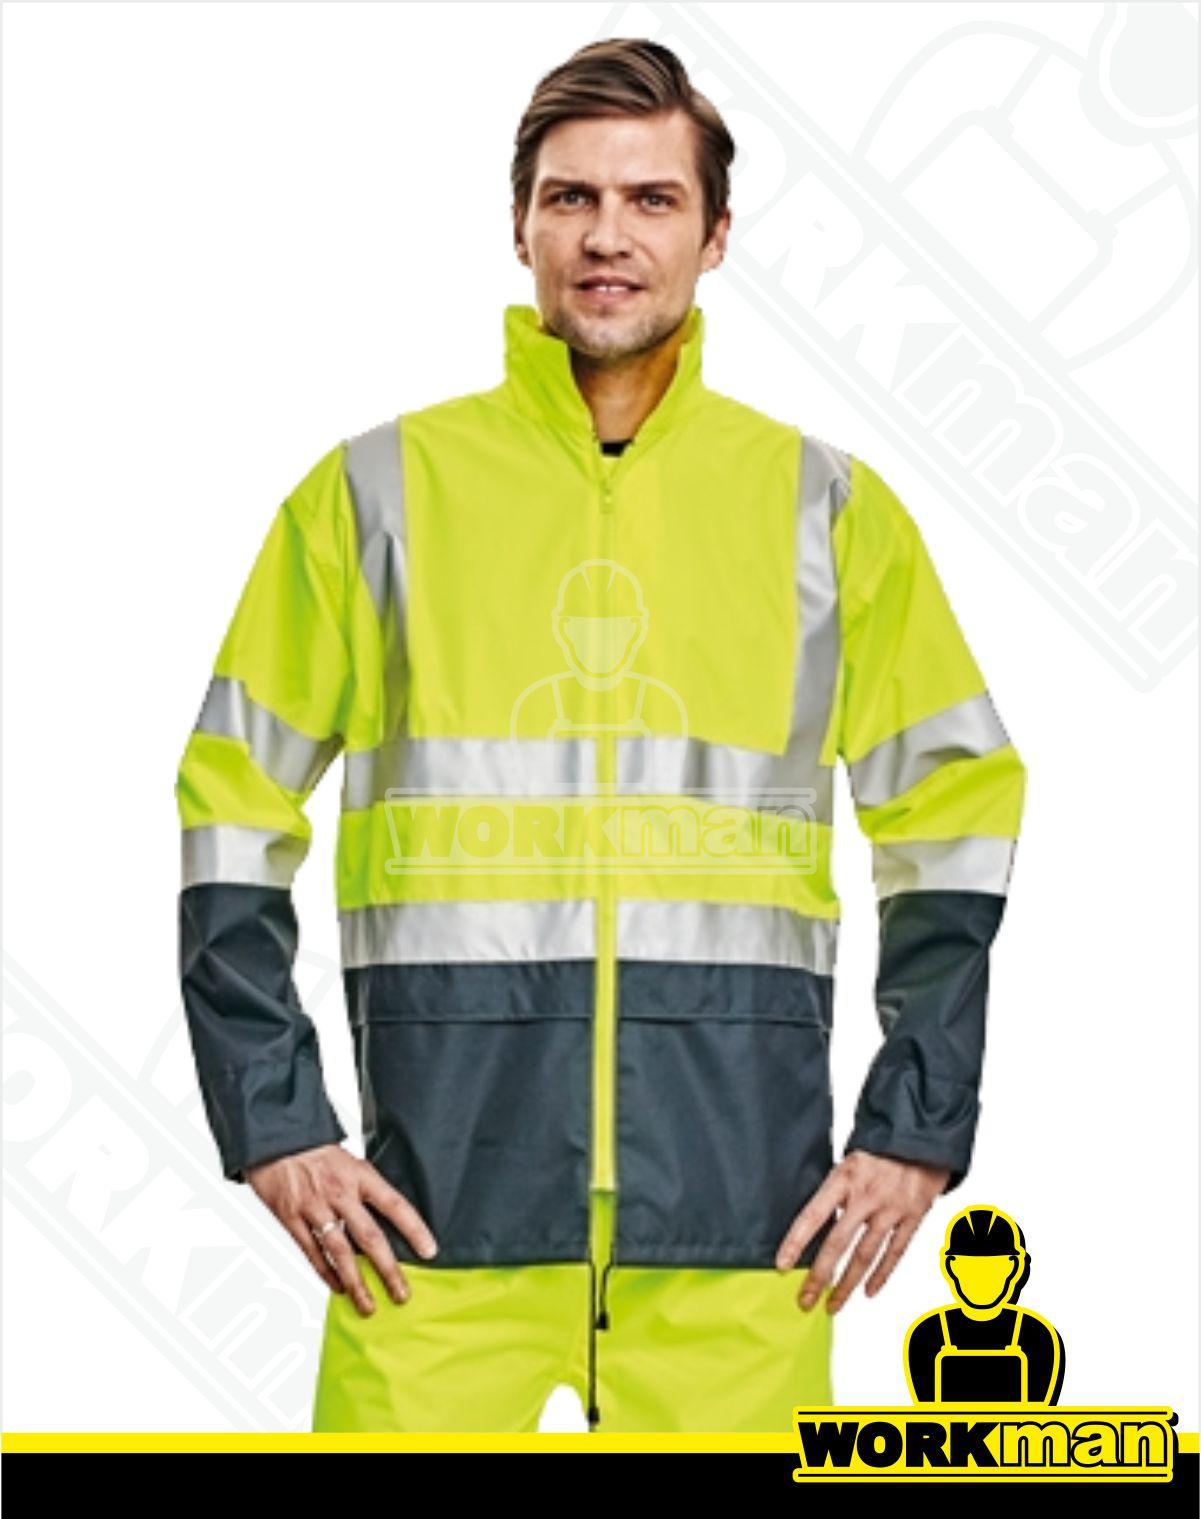 Reflexná vodeodolná bunda EPPING ČERVA oranžová Pracovné odevy WORKMAN b70d5d4060f